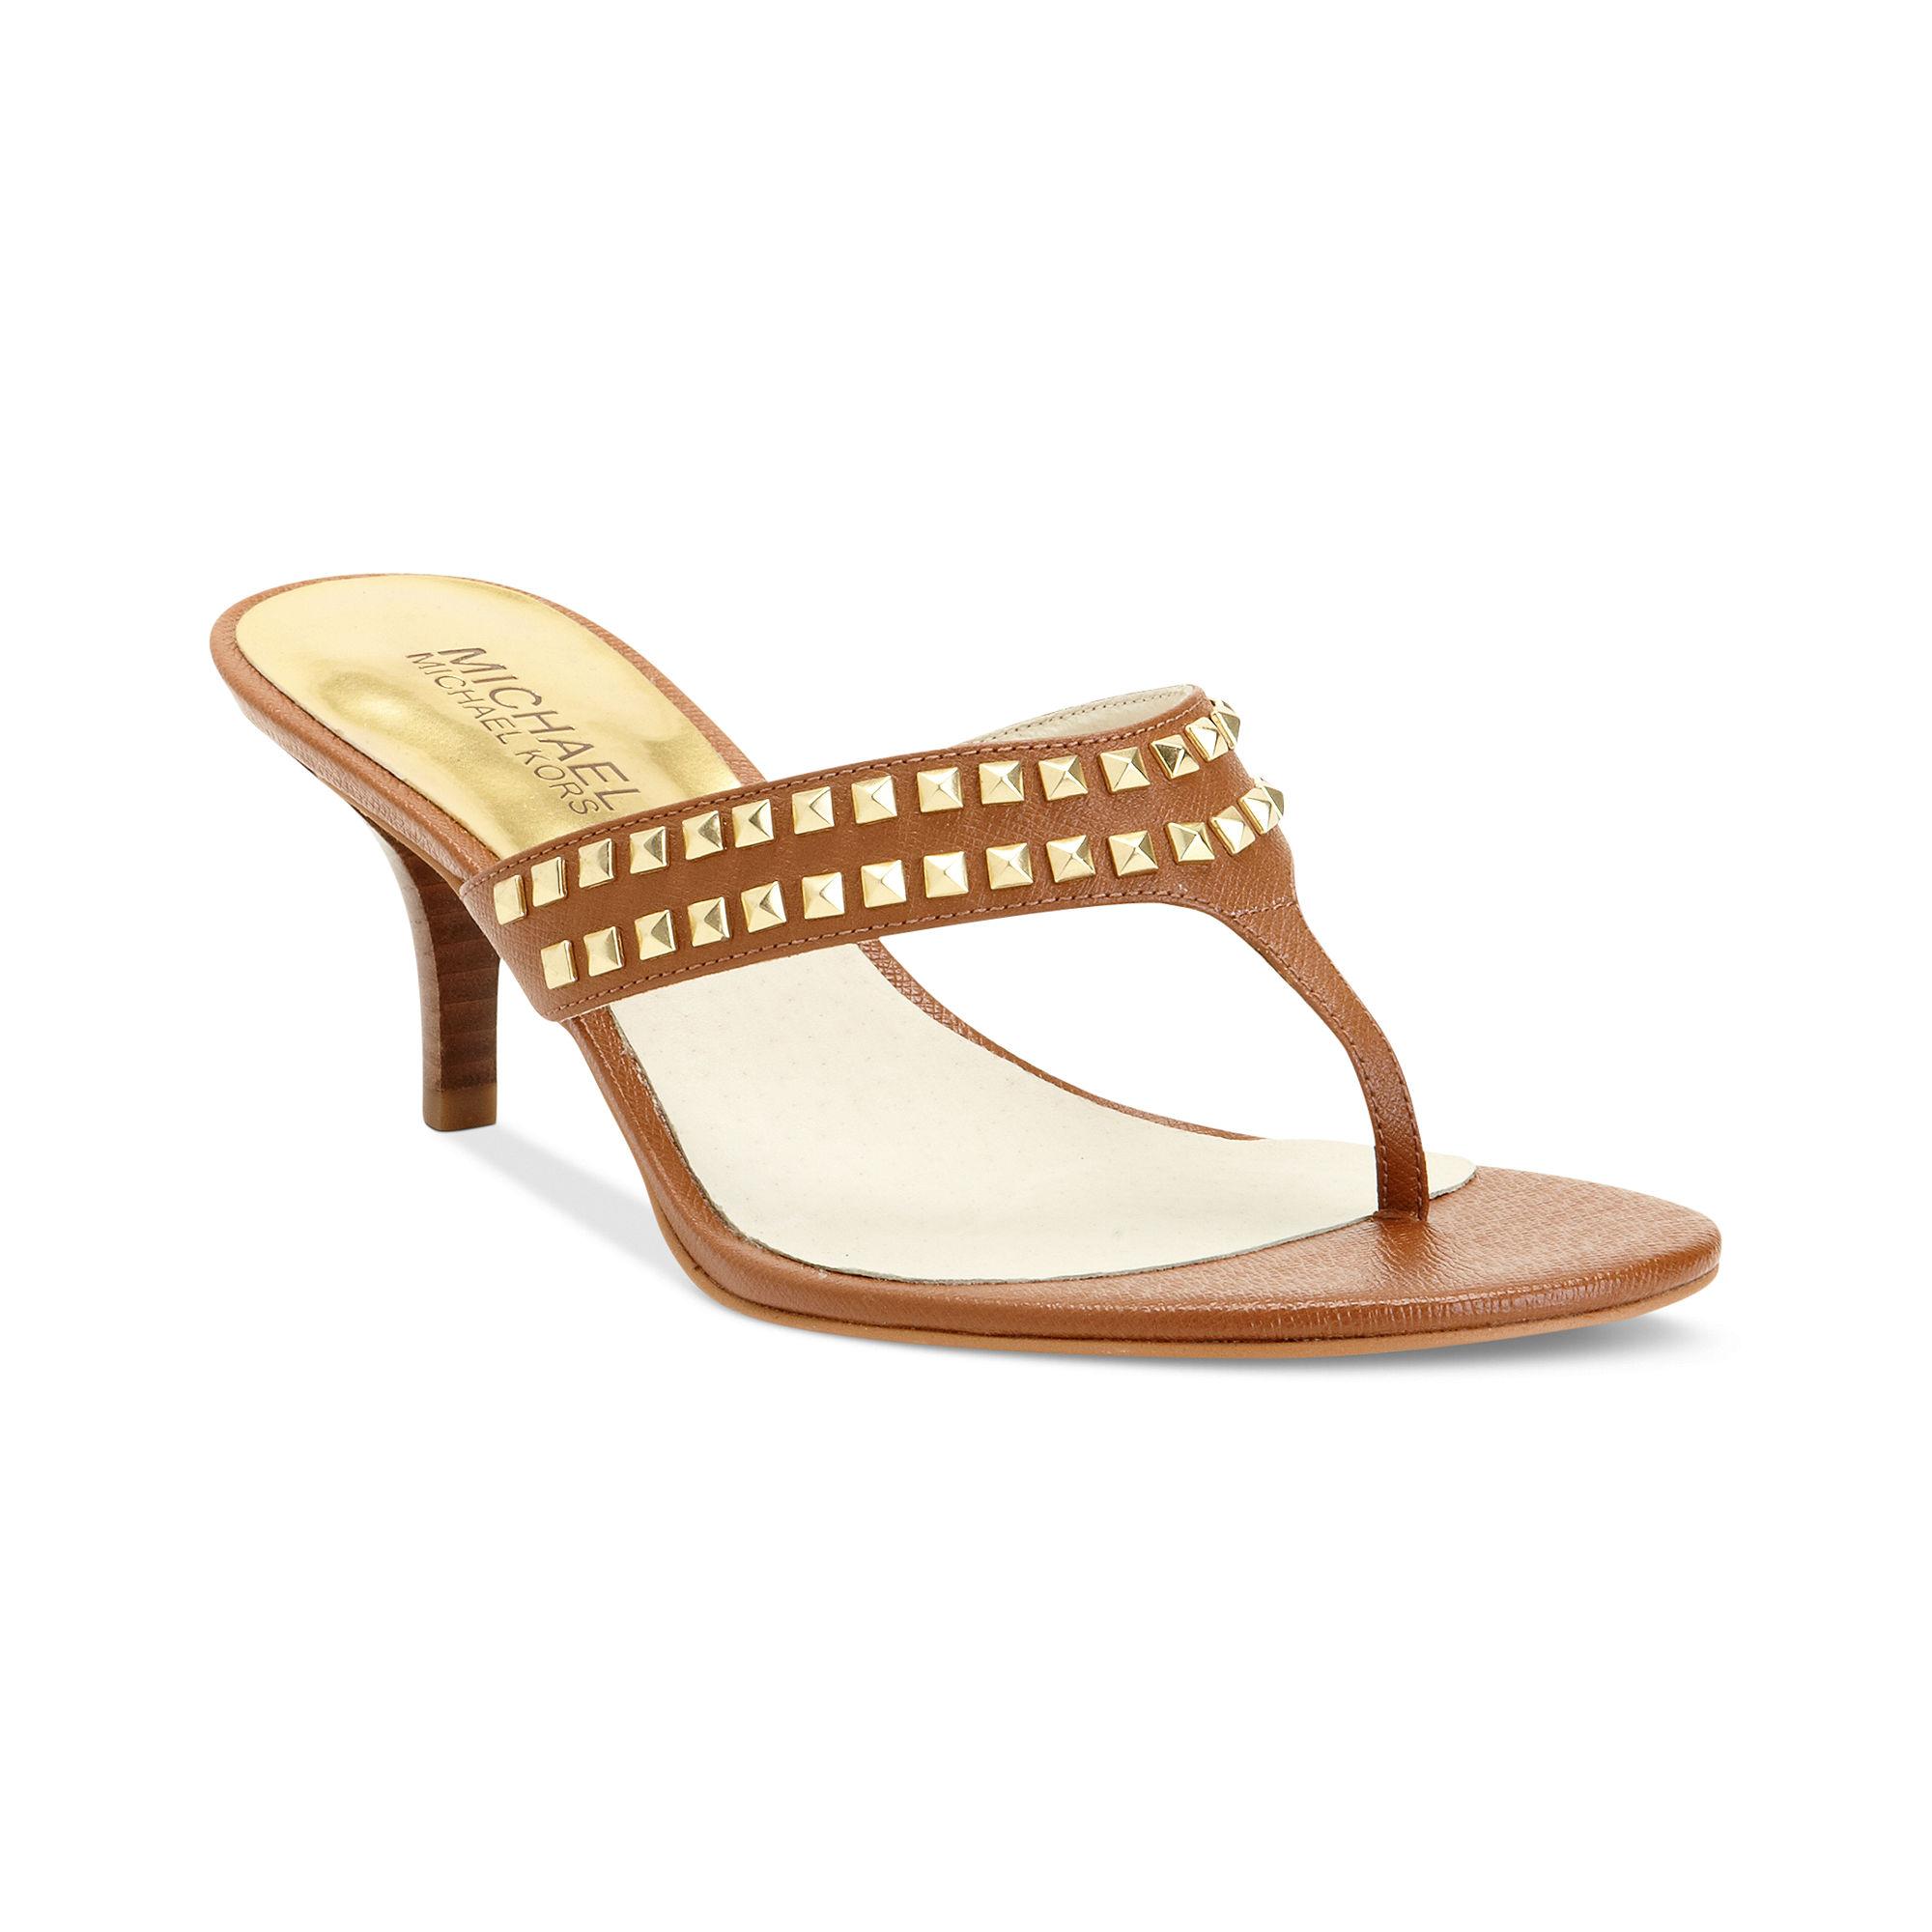 f39ef99703a1 Lyst michael kors alexi mid heel thong sandals in yellow jpg 2000x2000  Thong sandals heels